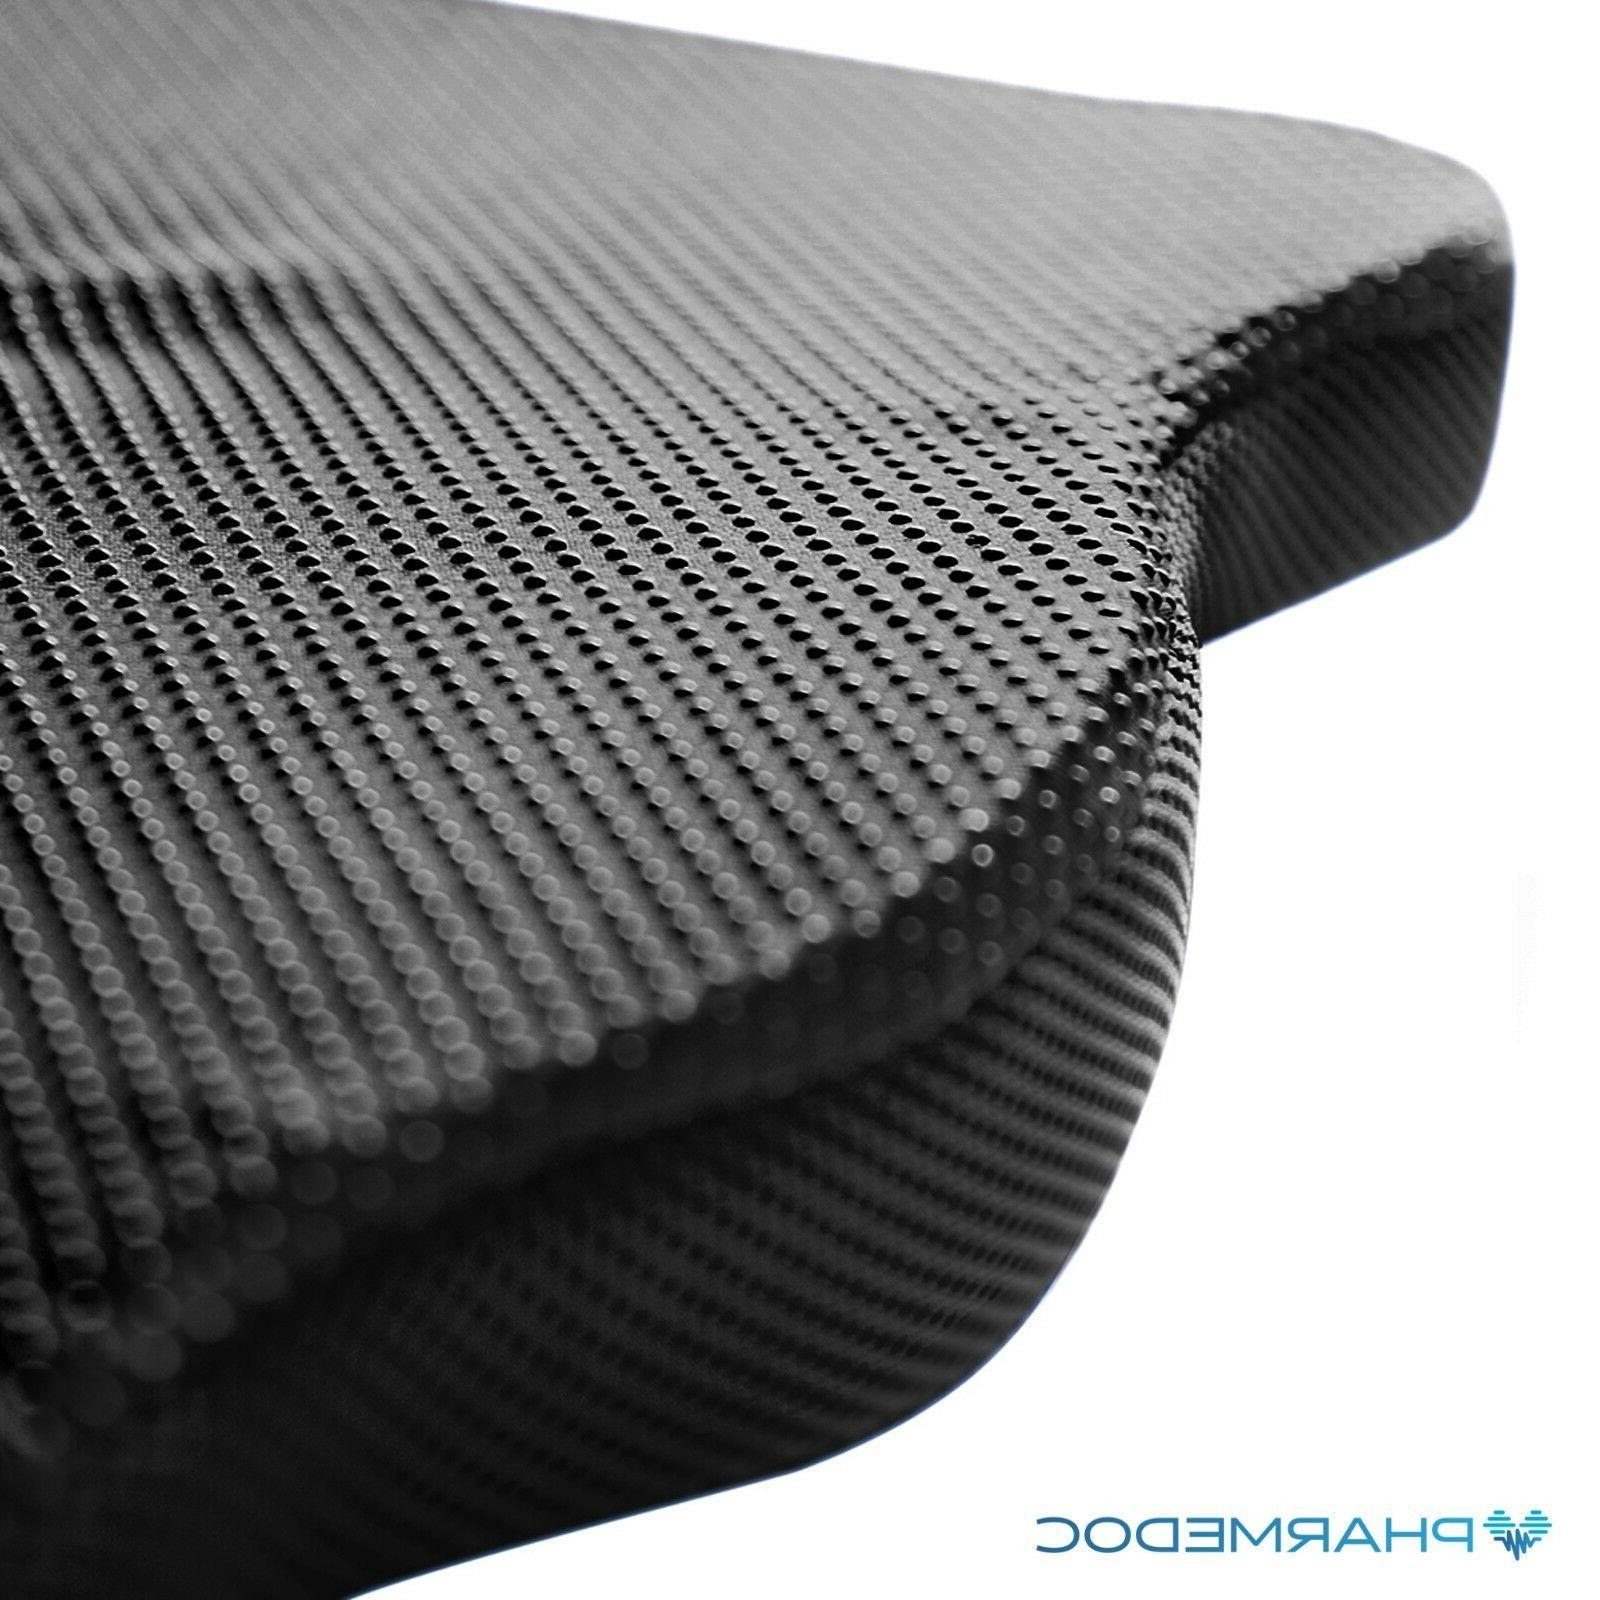 Orthopedic Seat - Foam Tailbone